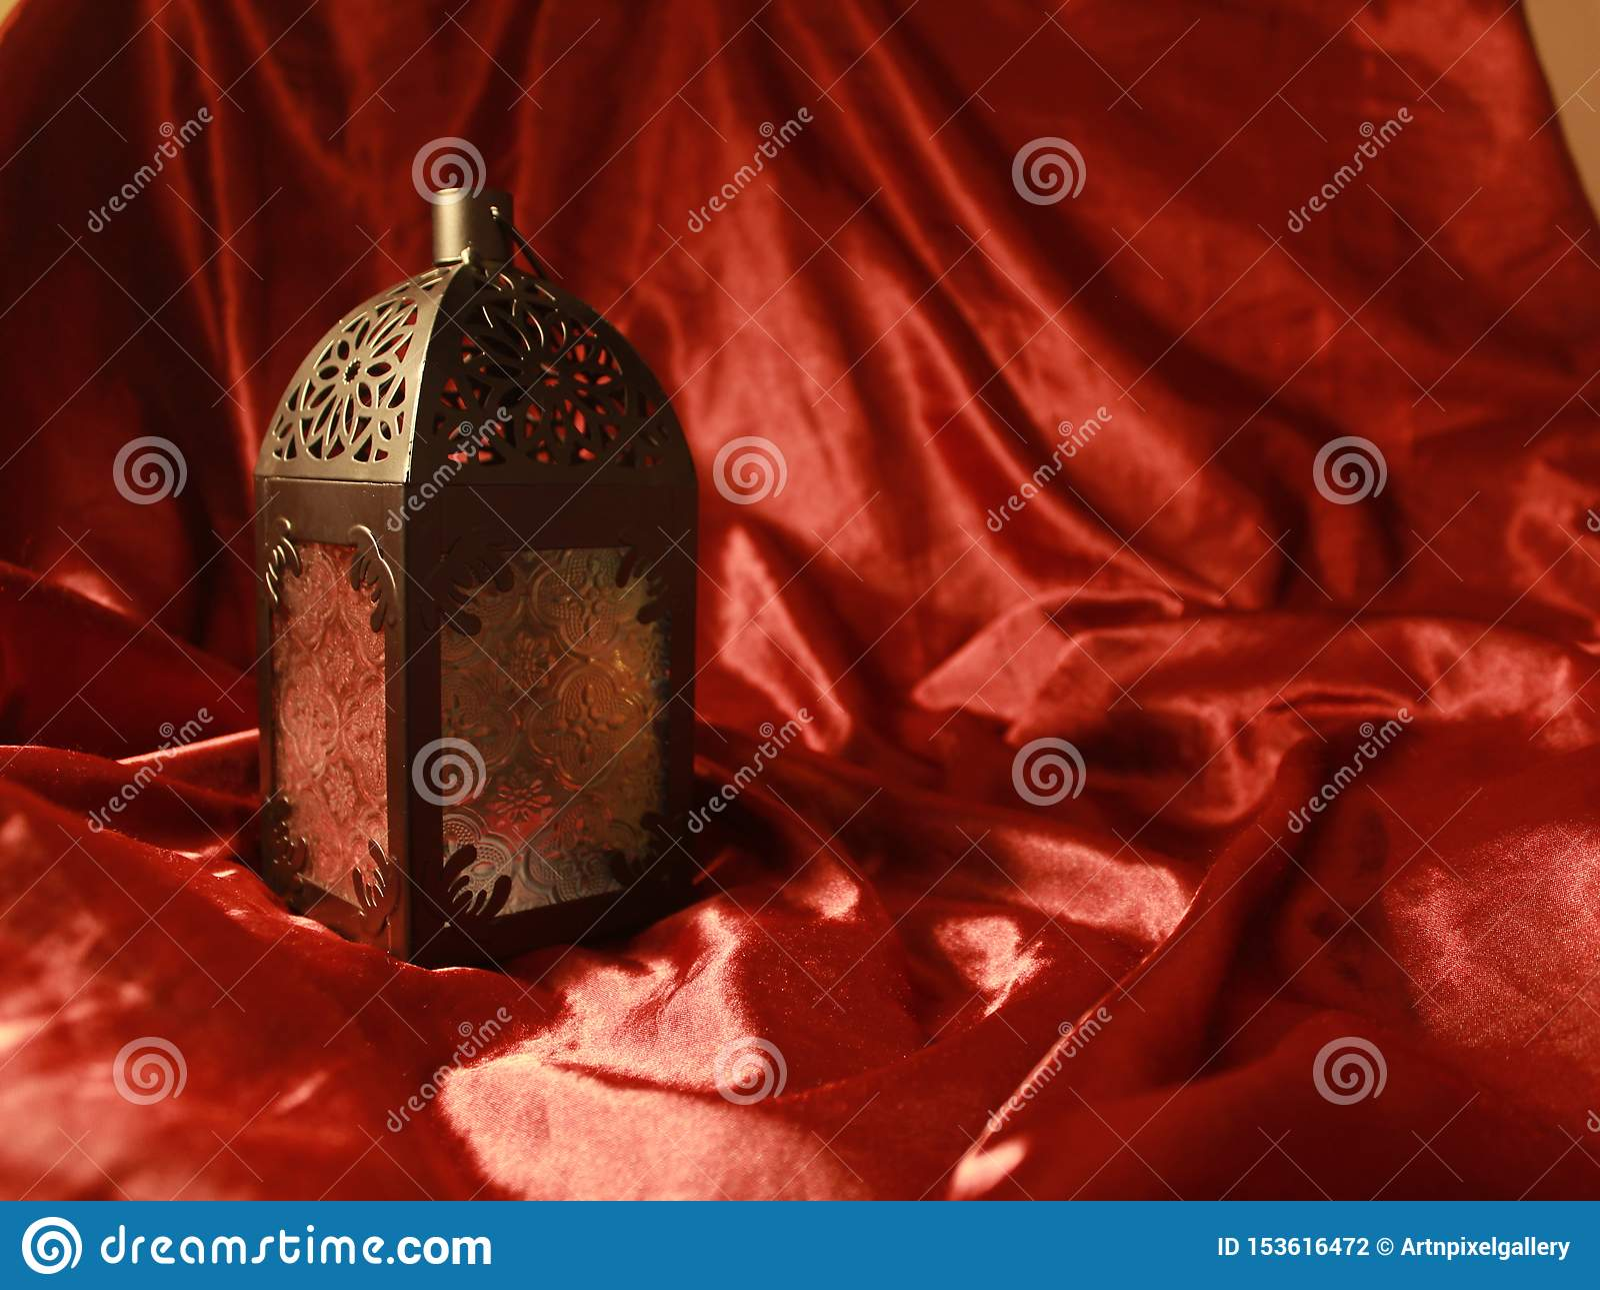 Arabian Lamp Eid Ramadan Celebration Festival With Rich Elegant Luxurious Red Silk Background Stock Photo Image Of Arabian Card 153616472